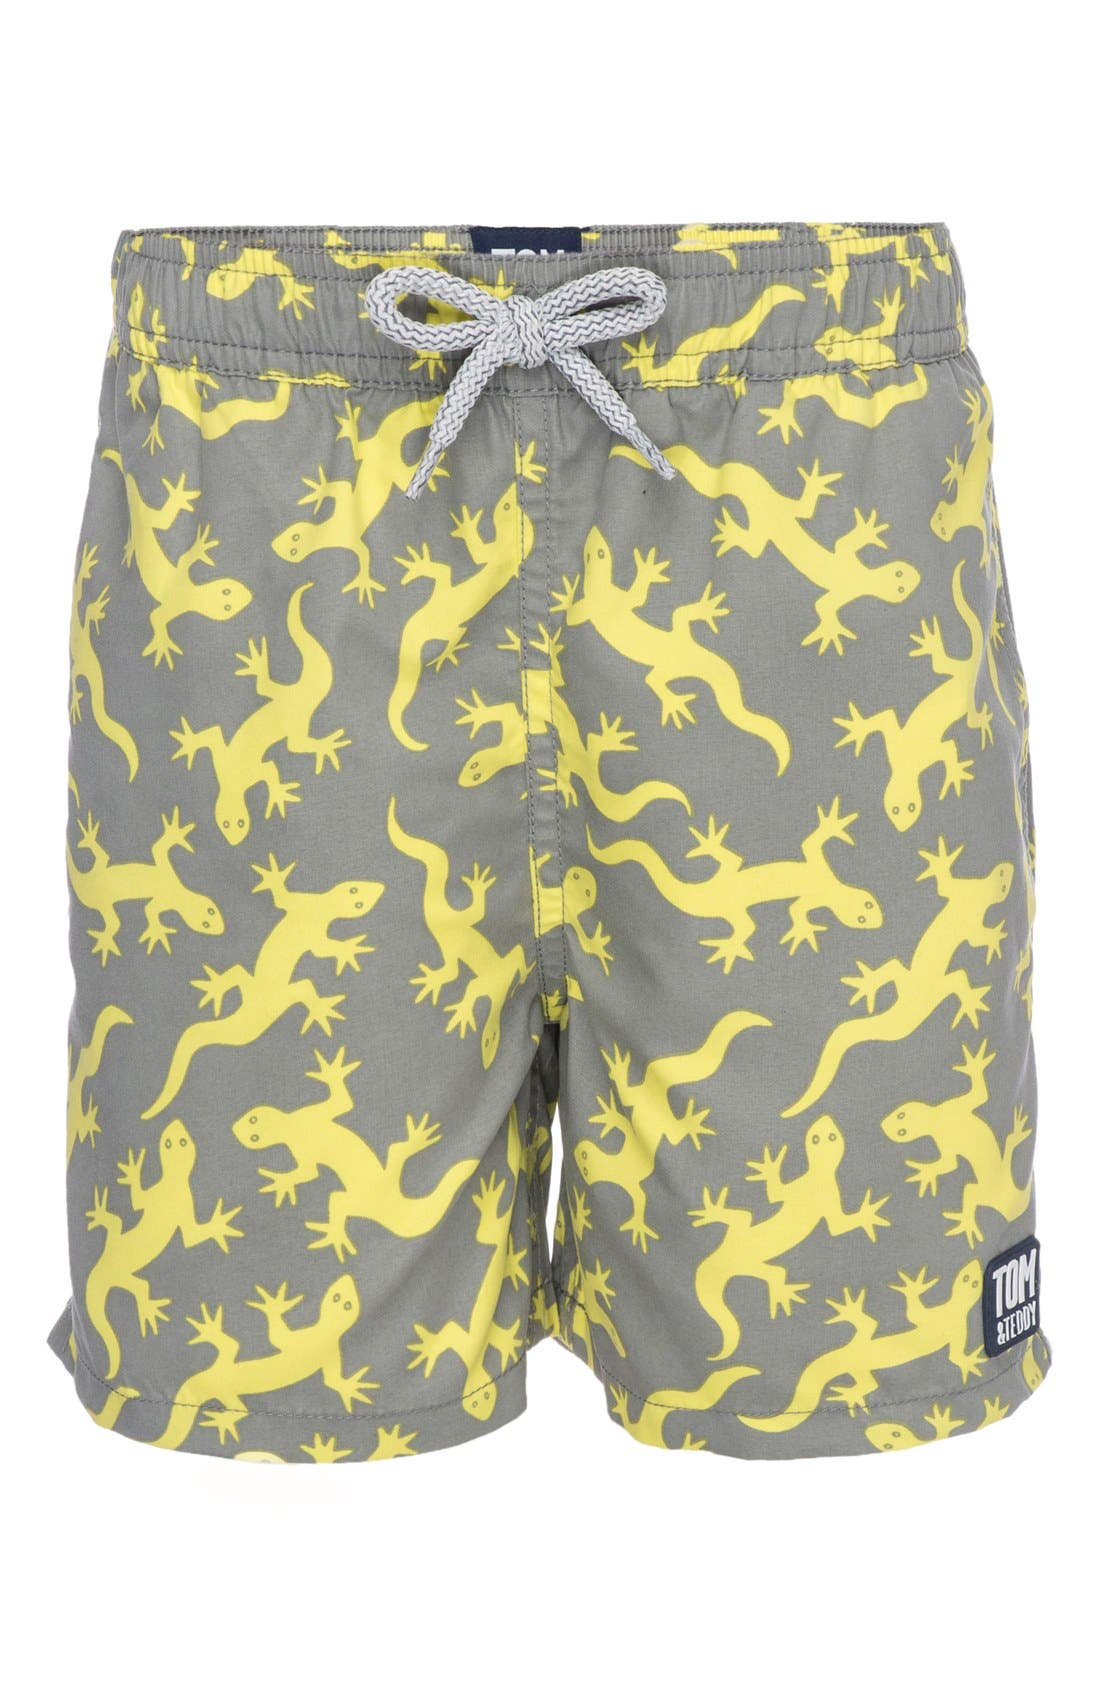 Tom & Teddy Lizards Swim Trunks (Toddler Boys, Little Boys & Big Boys)